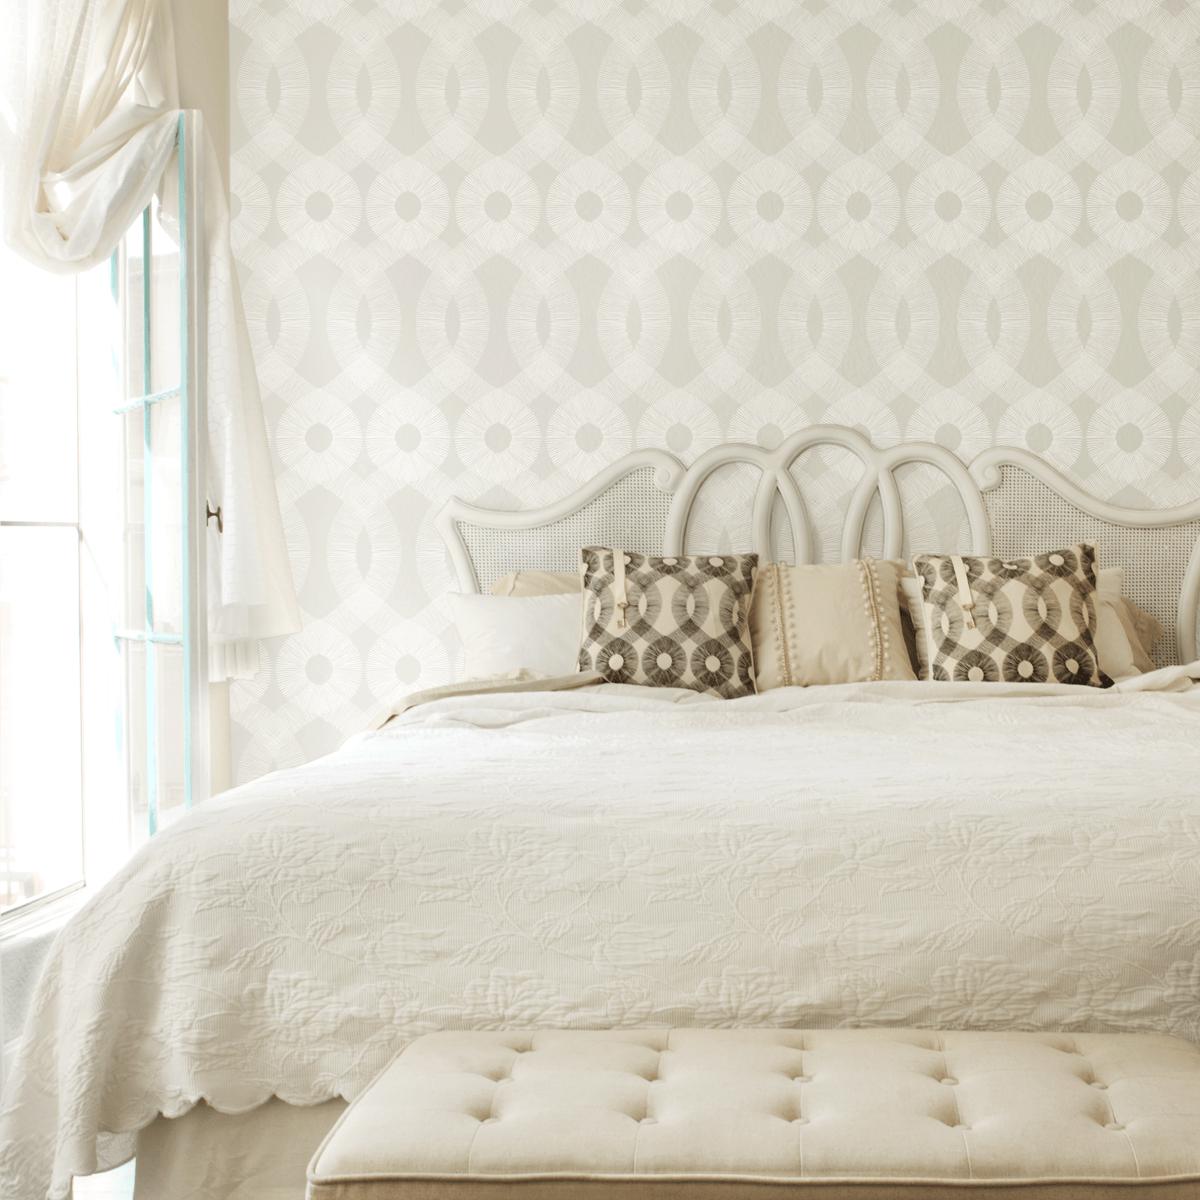 Bedroom Wallpaper Ideas - Cool Wallpapers